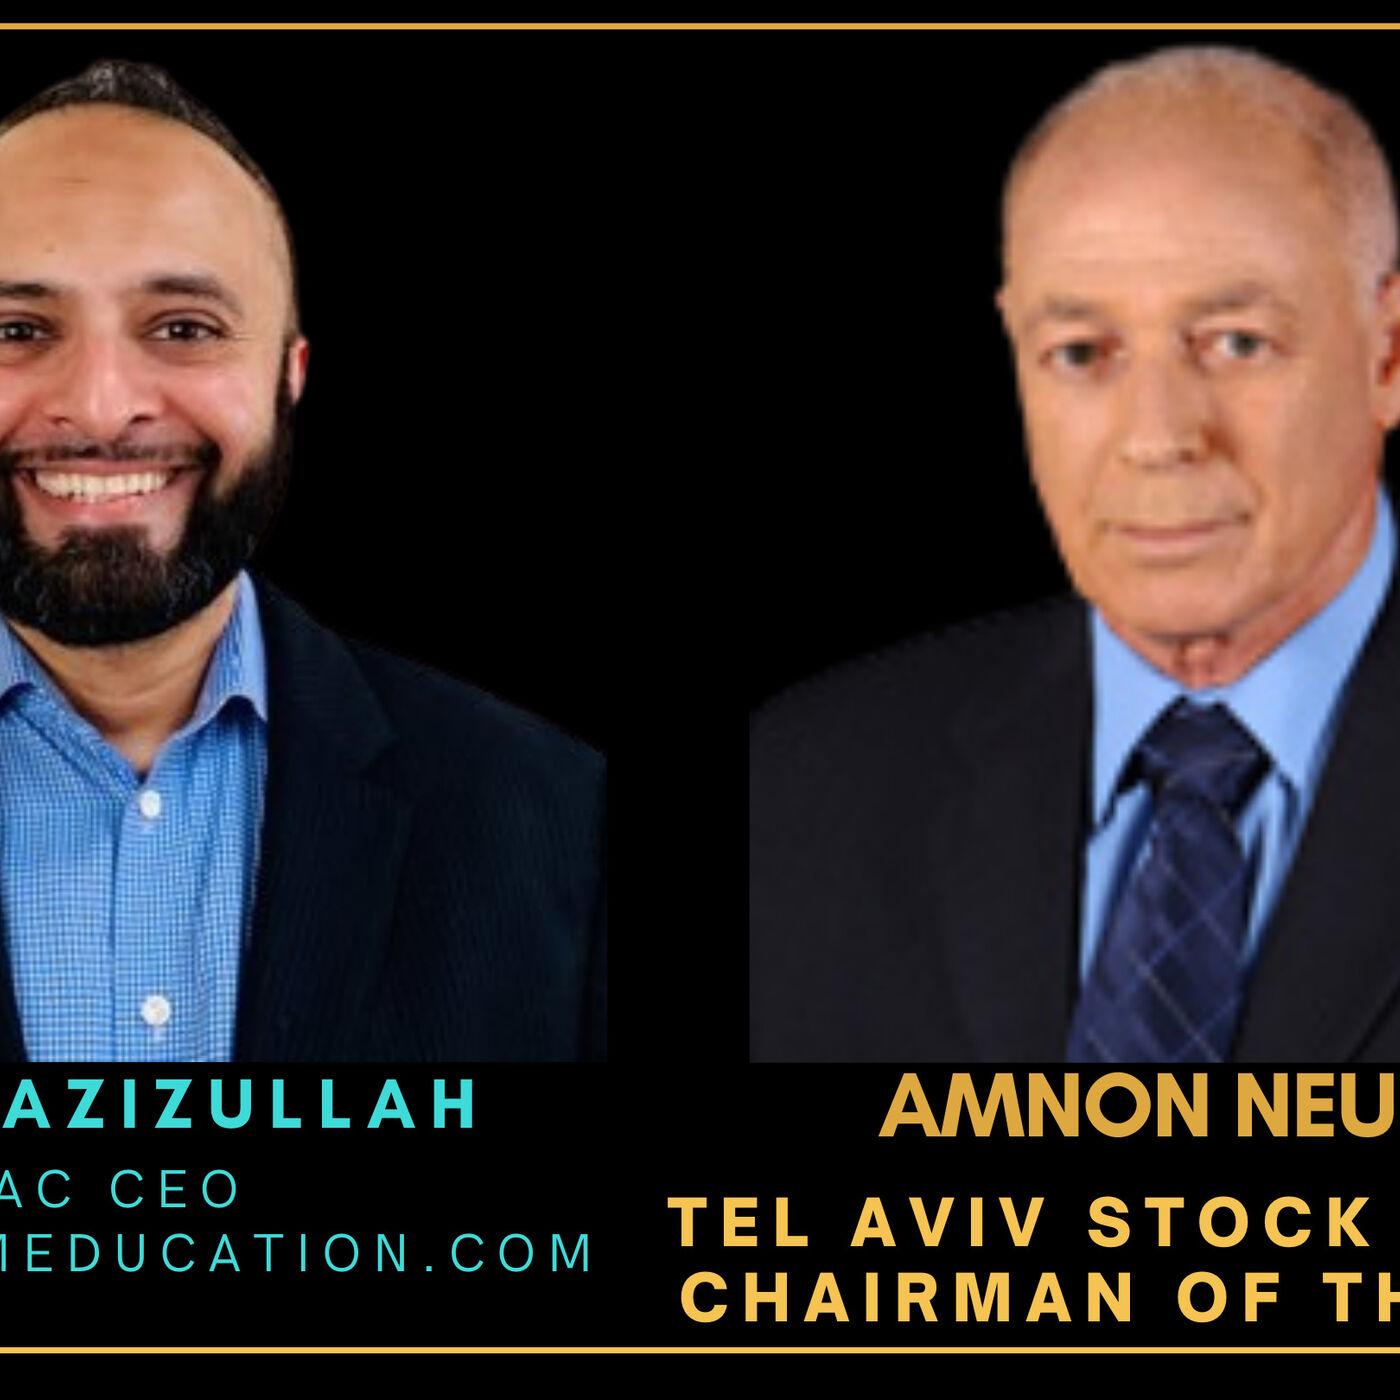 Tel Aviv Israel Stock Exchange Chairman Amnon Neubach & GBAC CEO Yusuf Azizullah discuss innovation